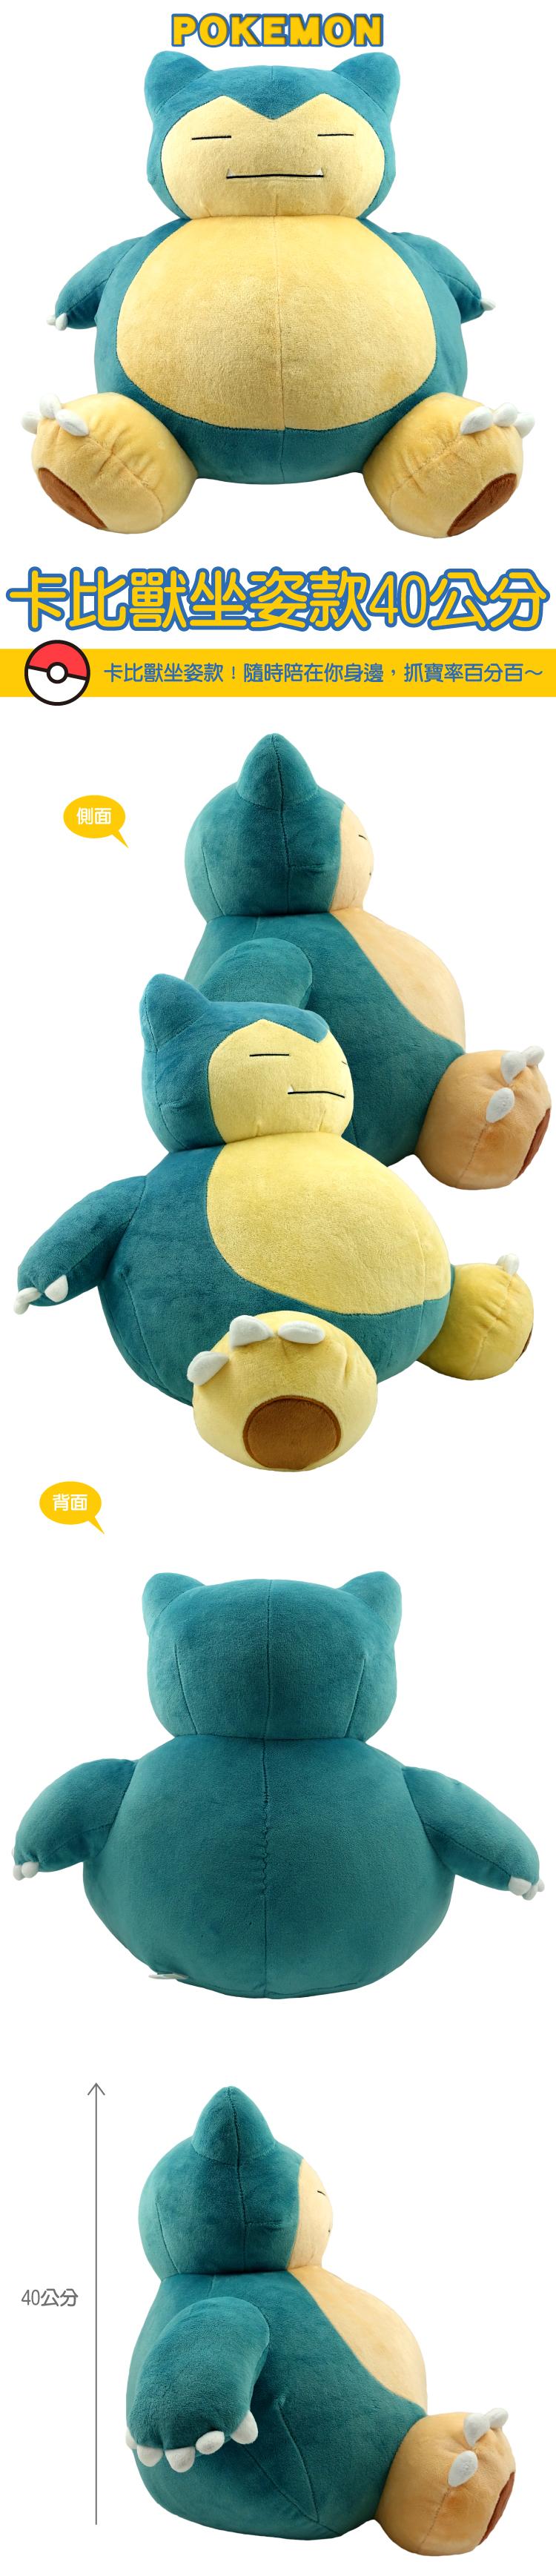 Pokemon精靈寶可夢 卡比獸坐姿B款 40公分【PM0301020806】